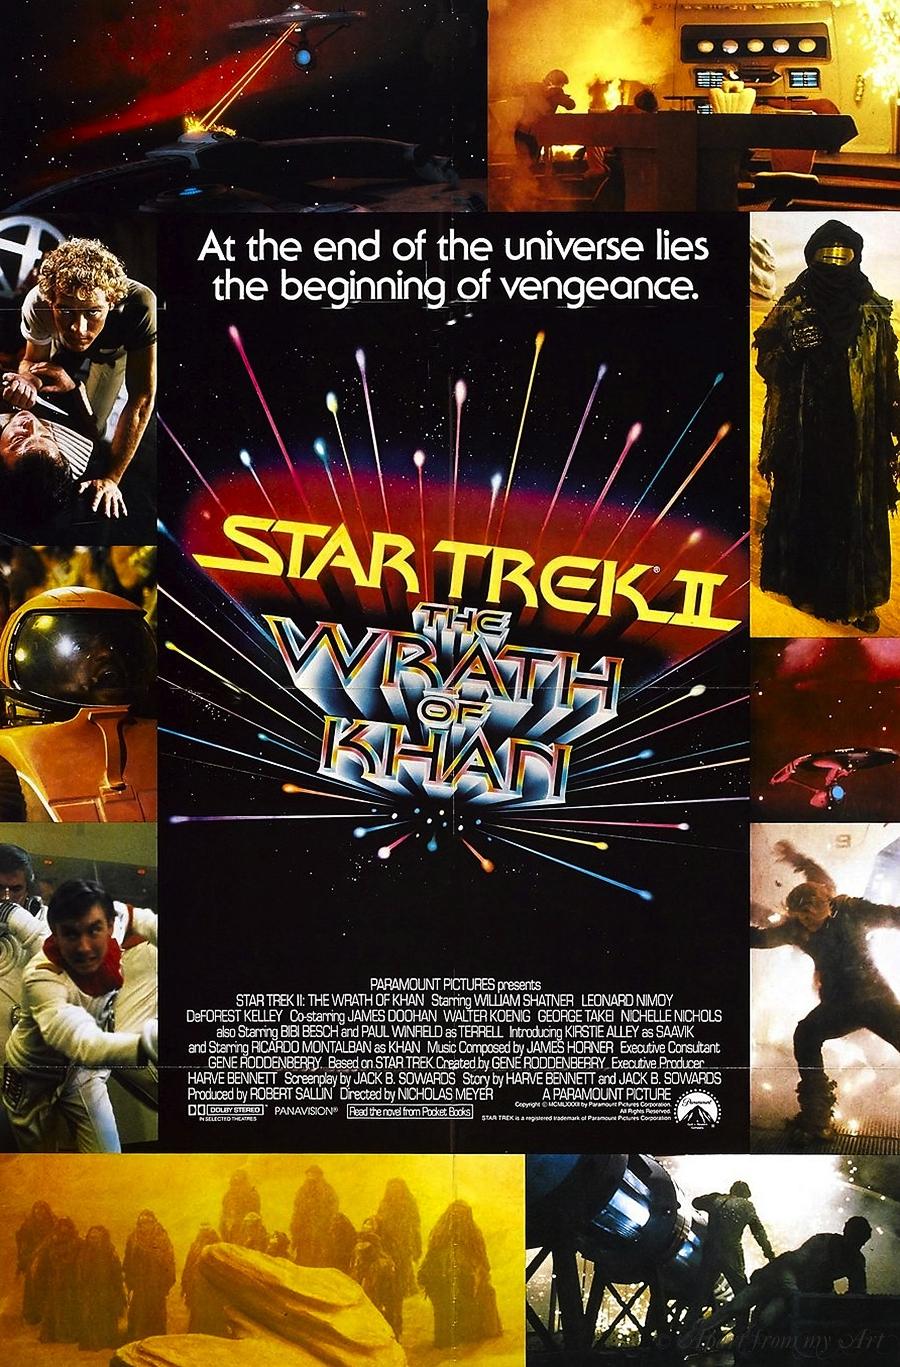 Star Trek II: The Wrath Of Khan Backgrounds on Wallpapers Vista